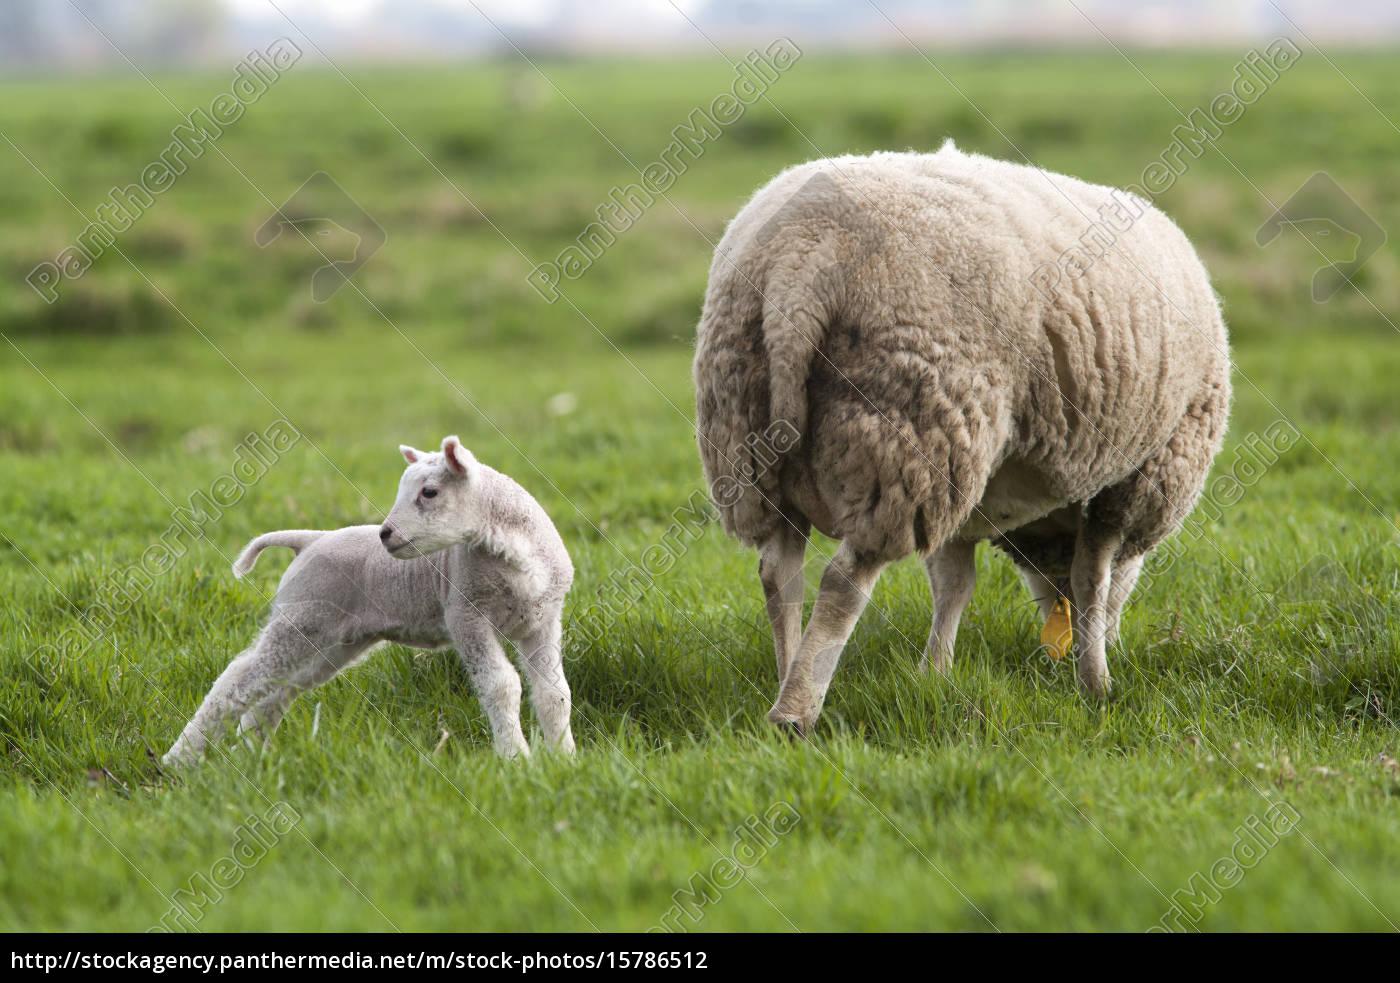 lamb, behind, mother - 15786512